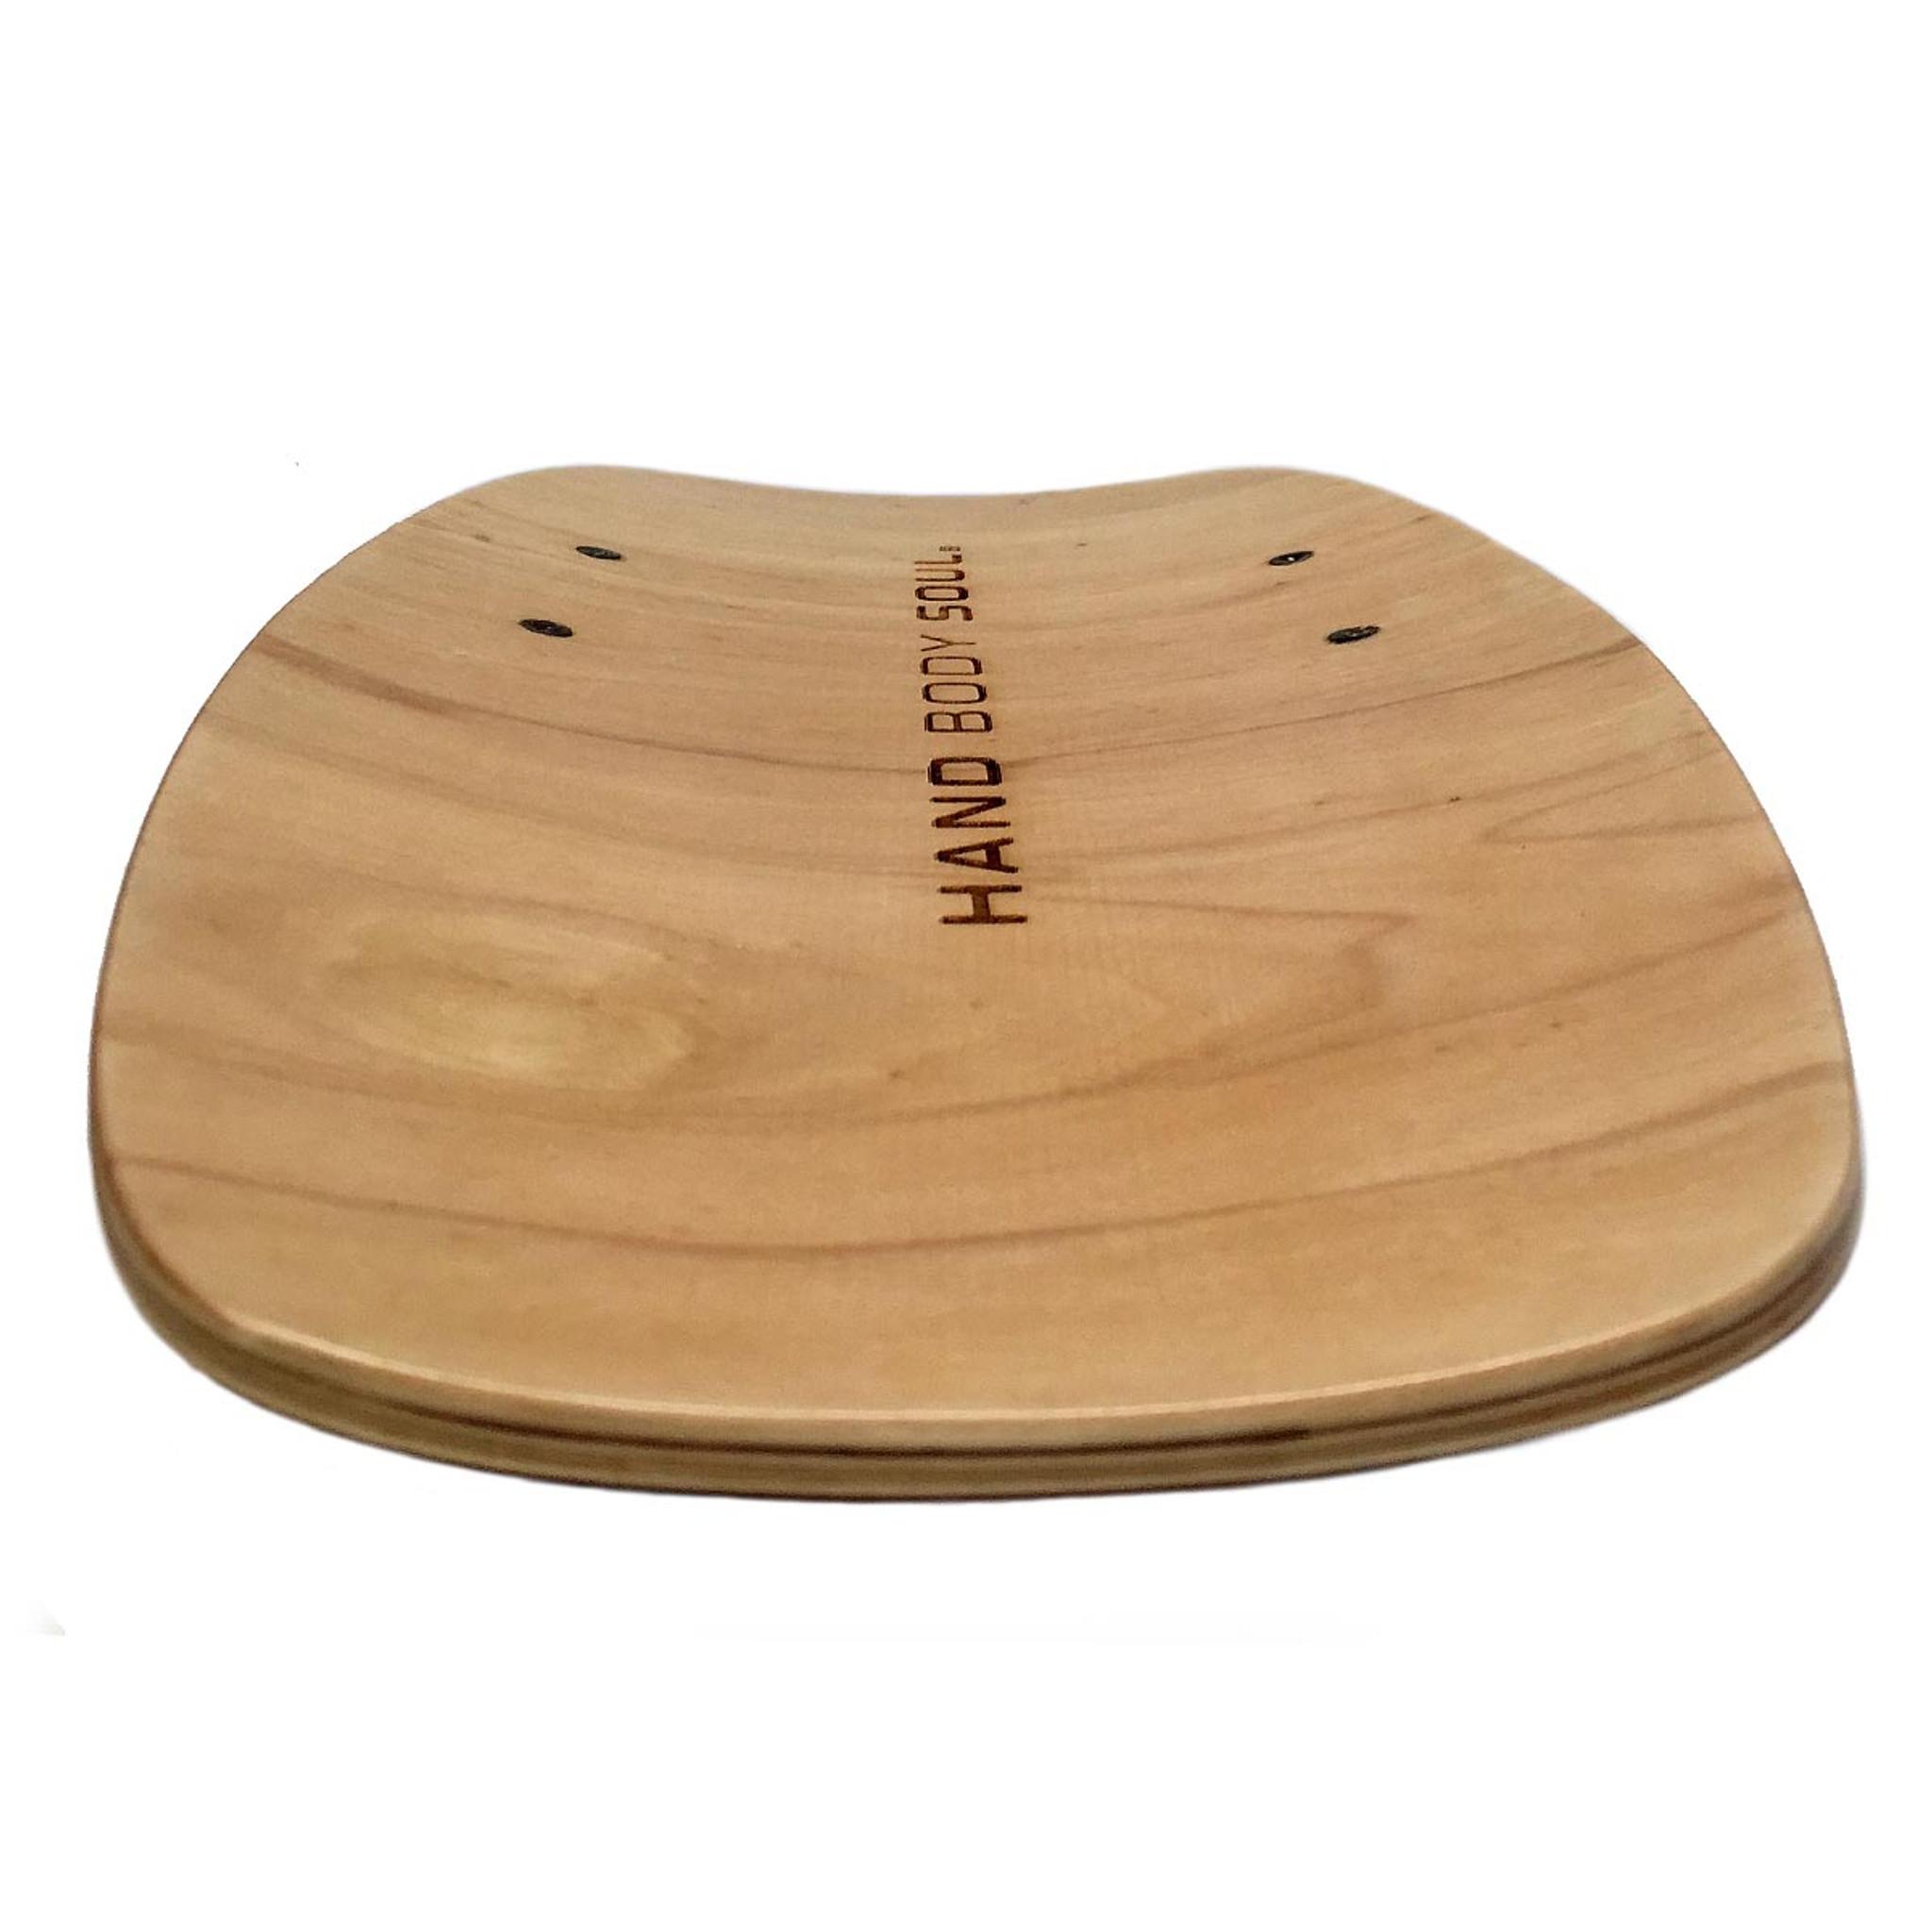 Premium Bodysurfing Tools - Wood Handboard PF2s Socks Savers